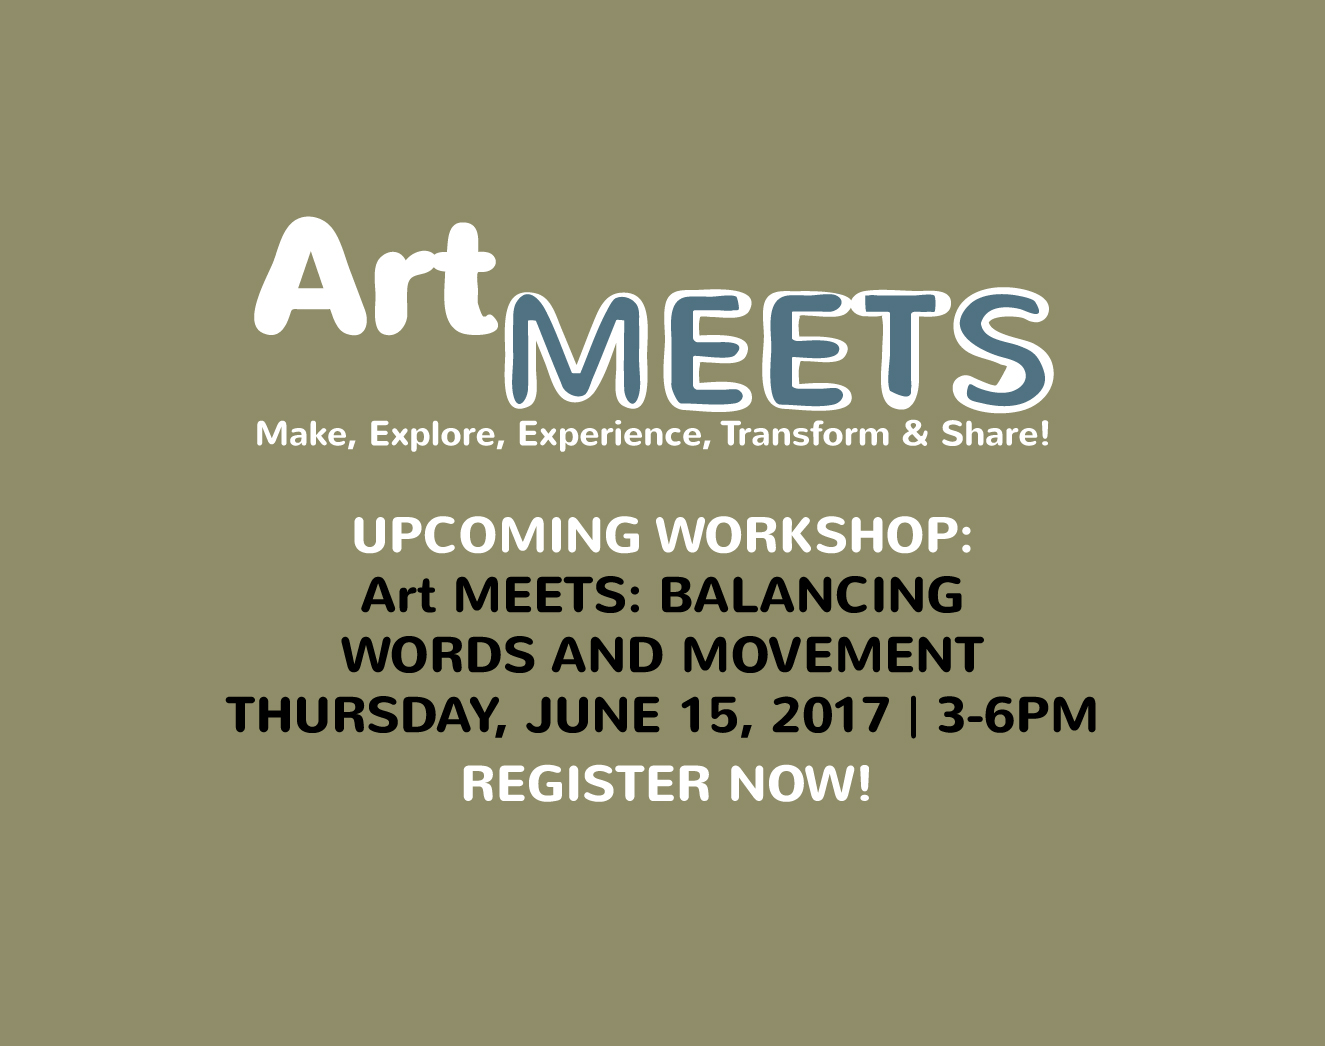 Art MEETS: Balancing Words & Movement